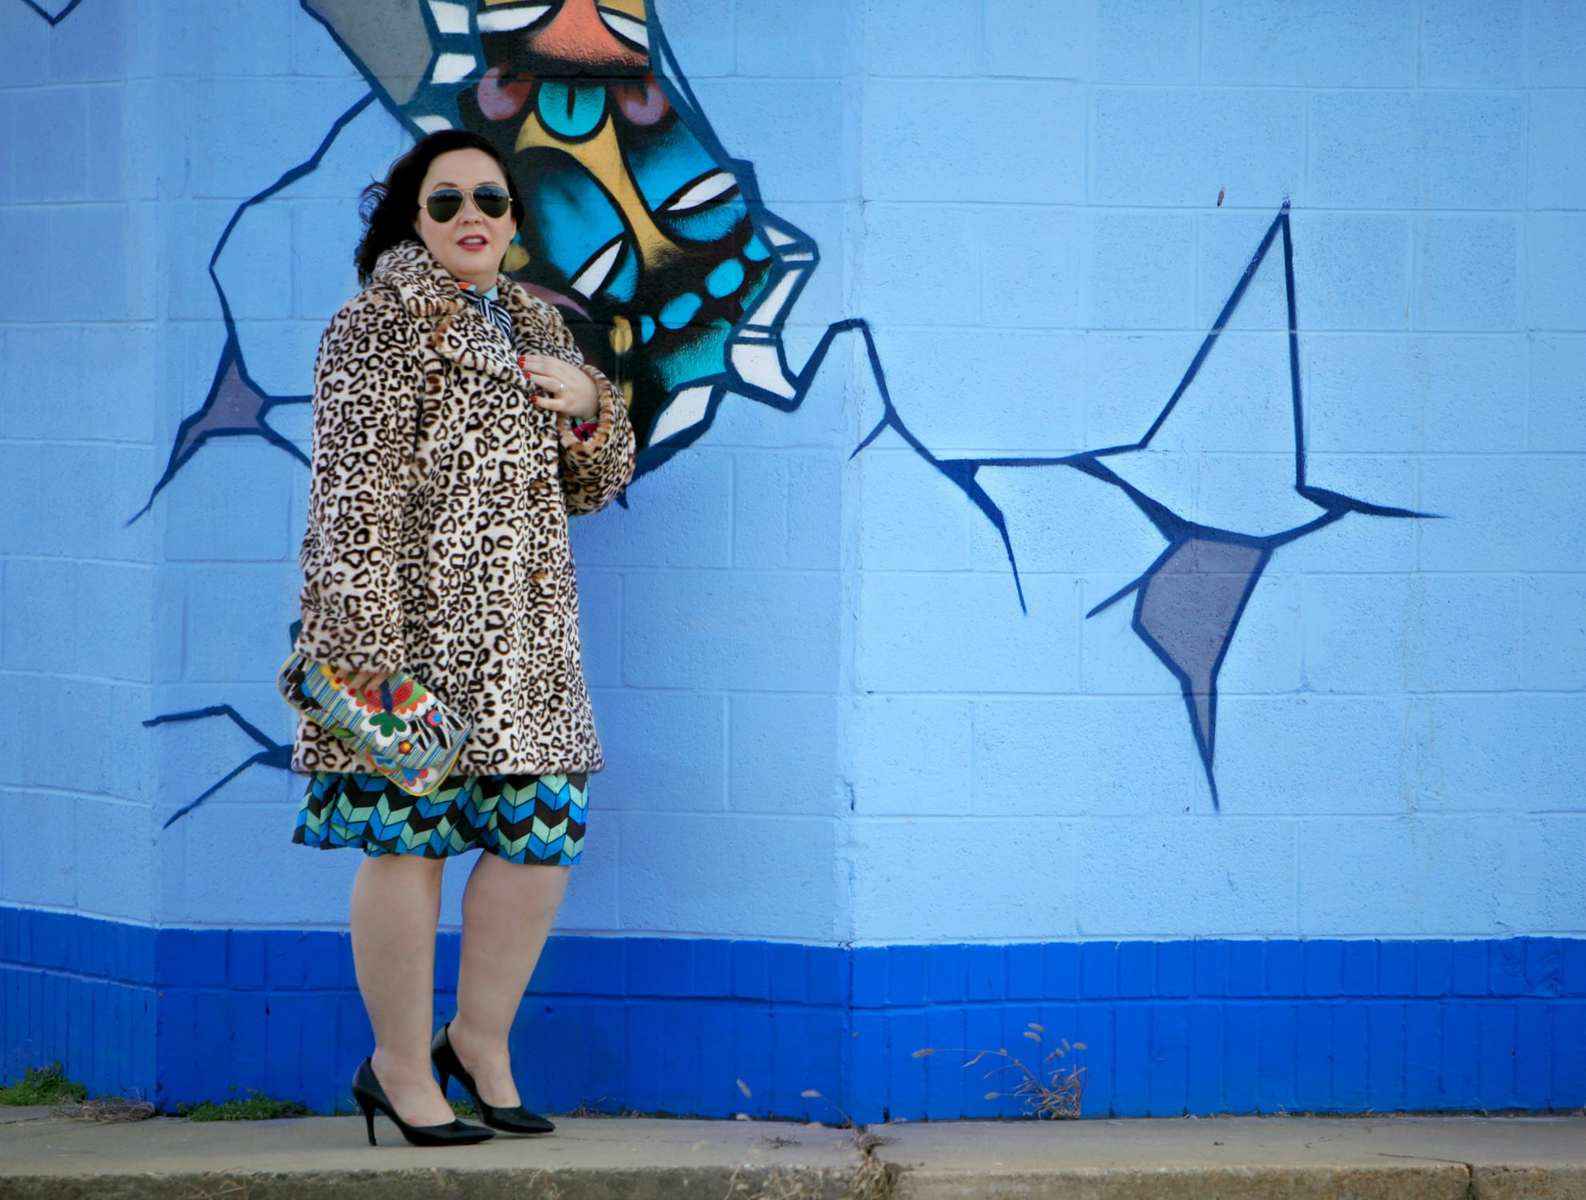 wardrobe oxygen over 40 fashion blog usa